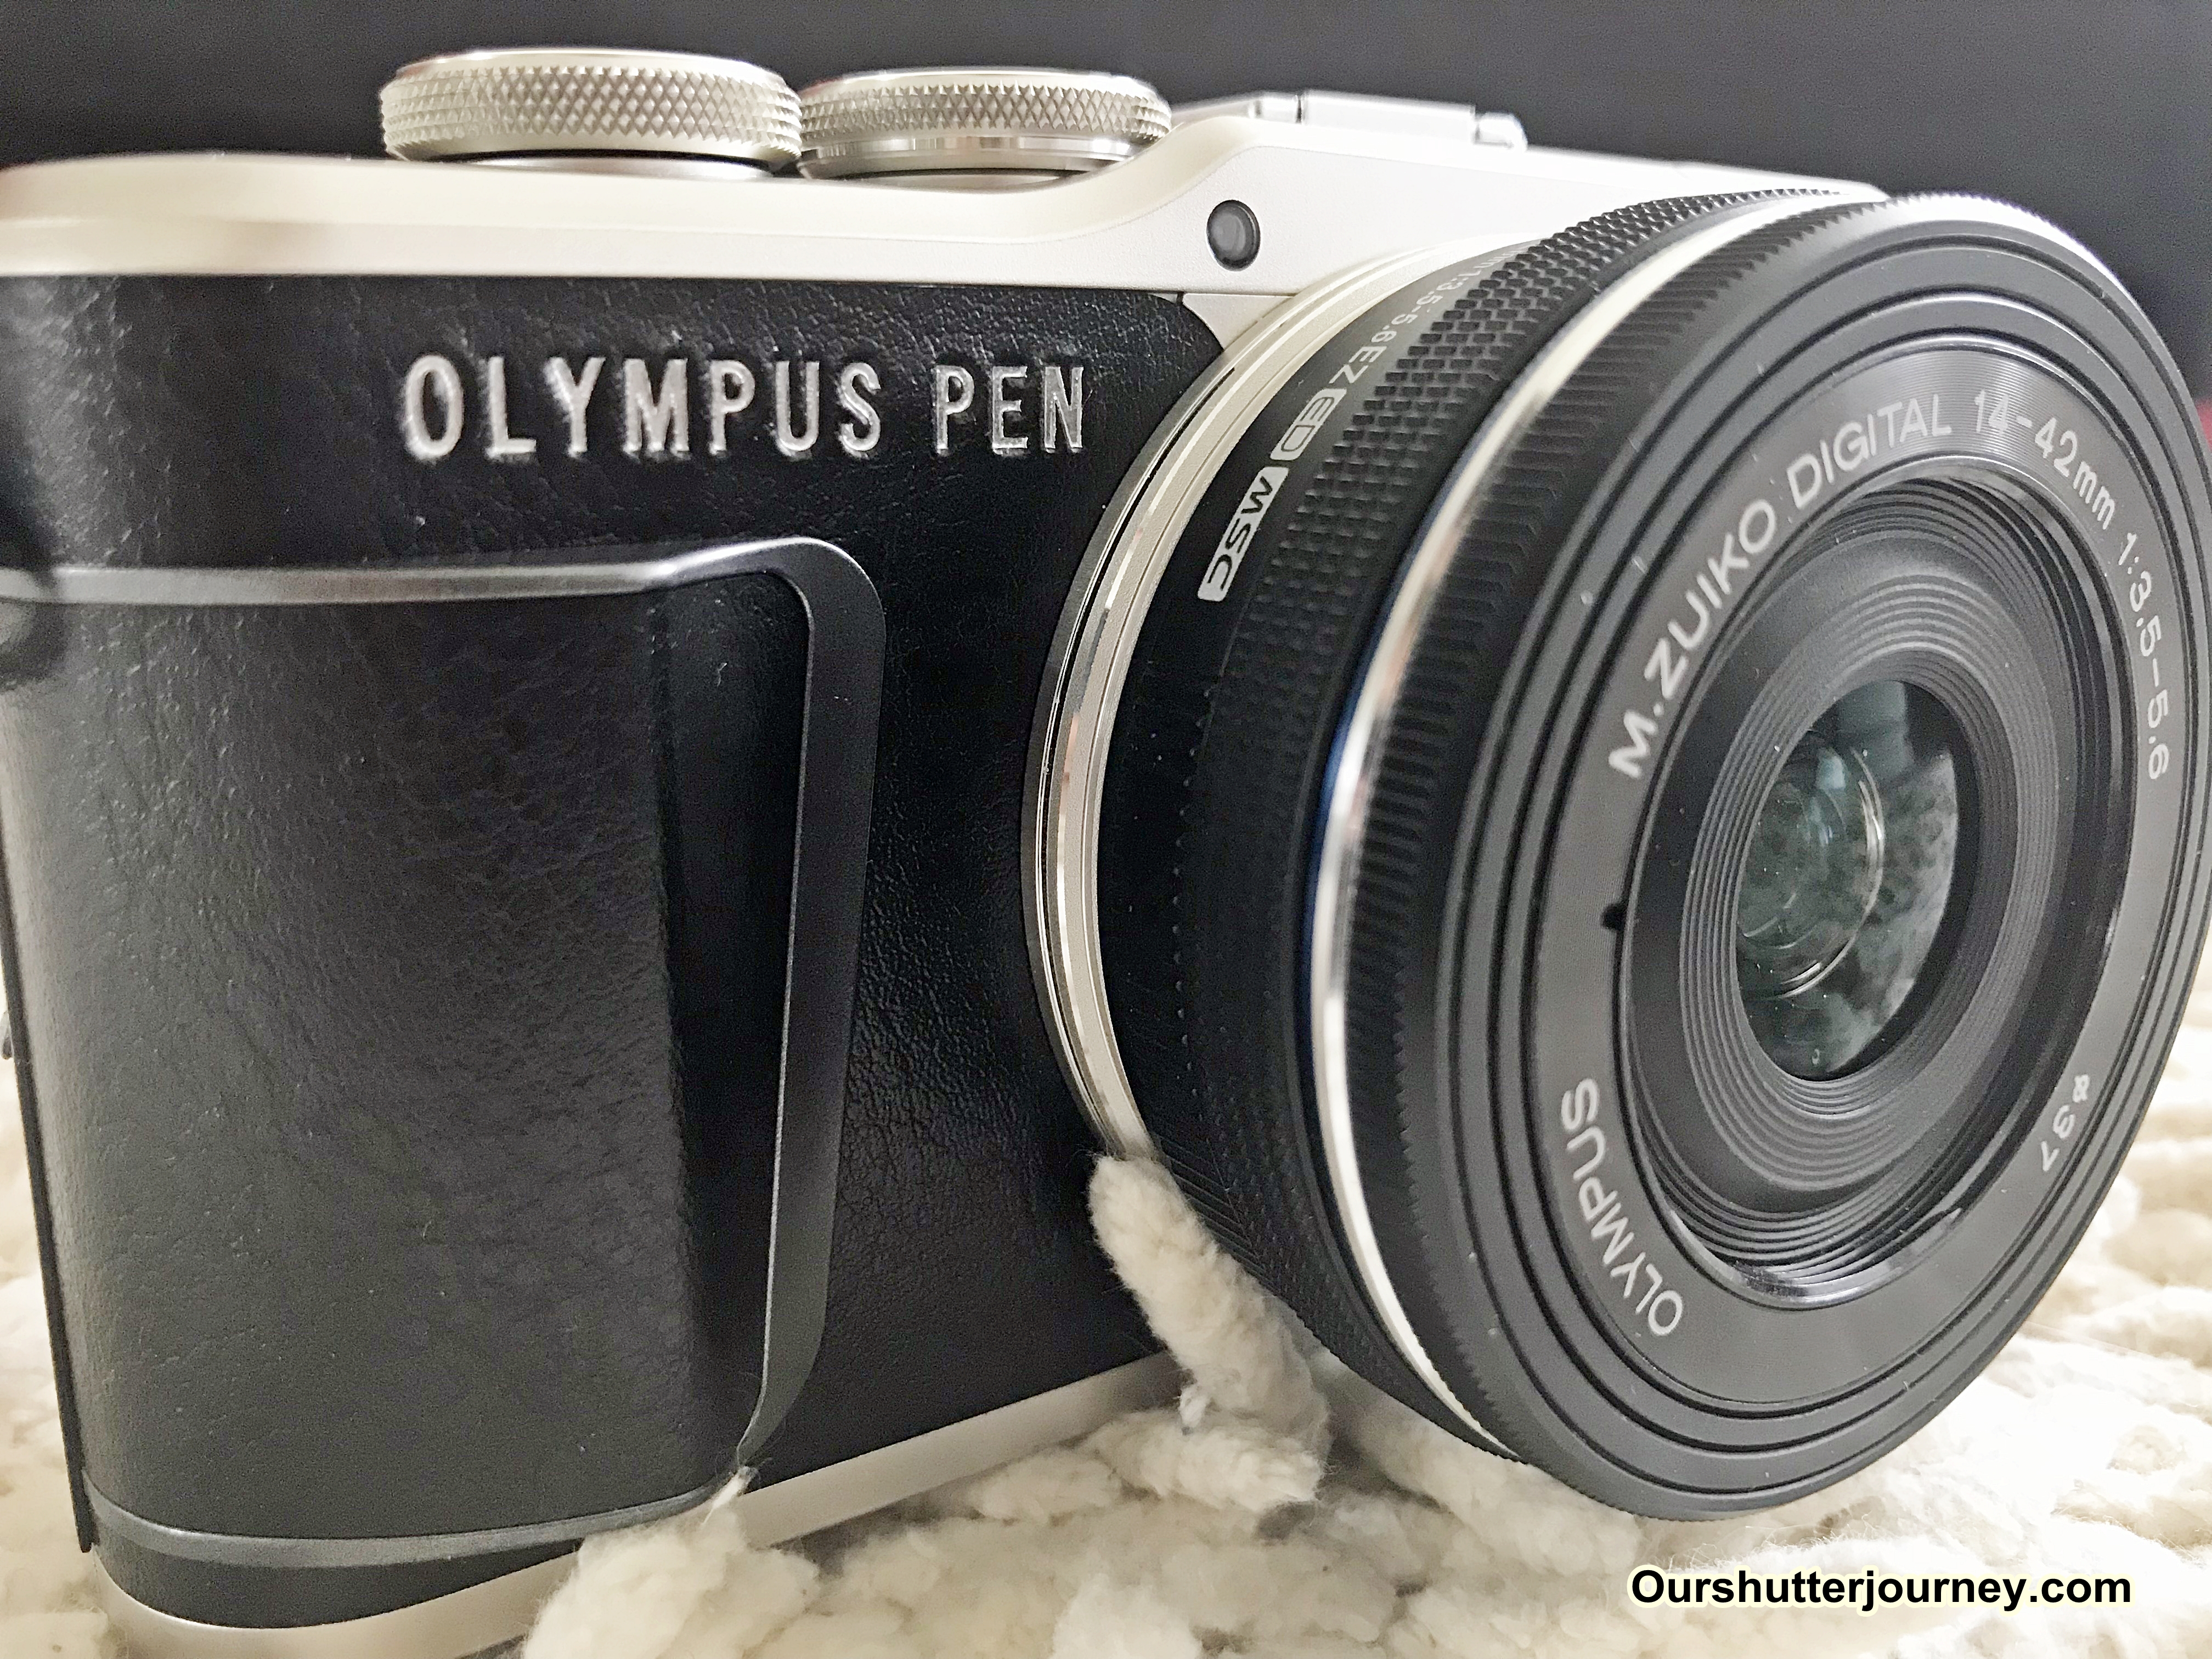 Https Sjs Events 2018 11 28t091901 0000 Olympus Mzuiko Digital Ed 12 50mm F35 63 Ez Lens Img 1506